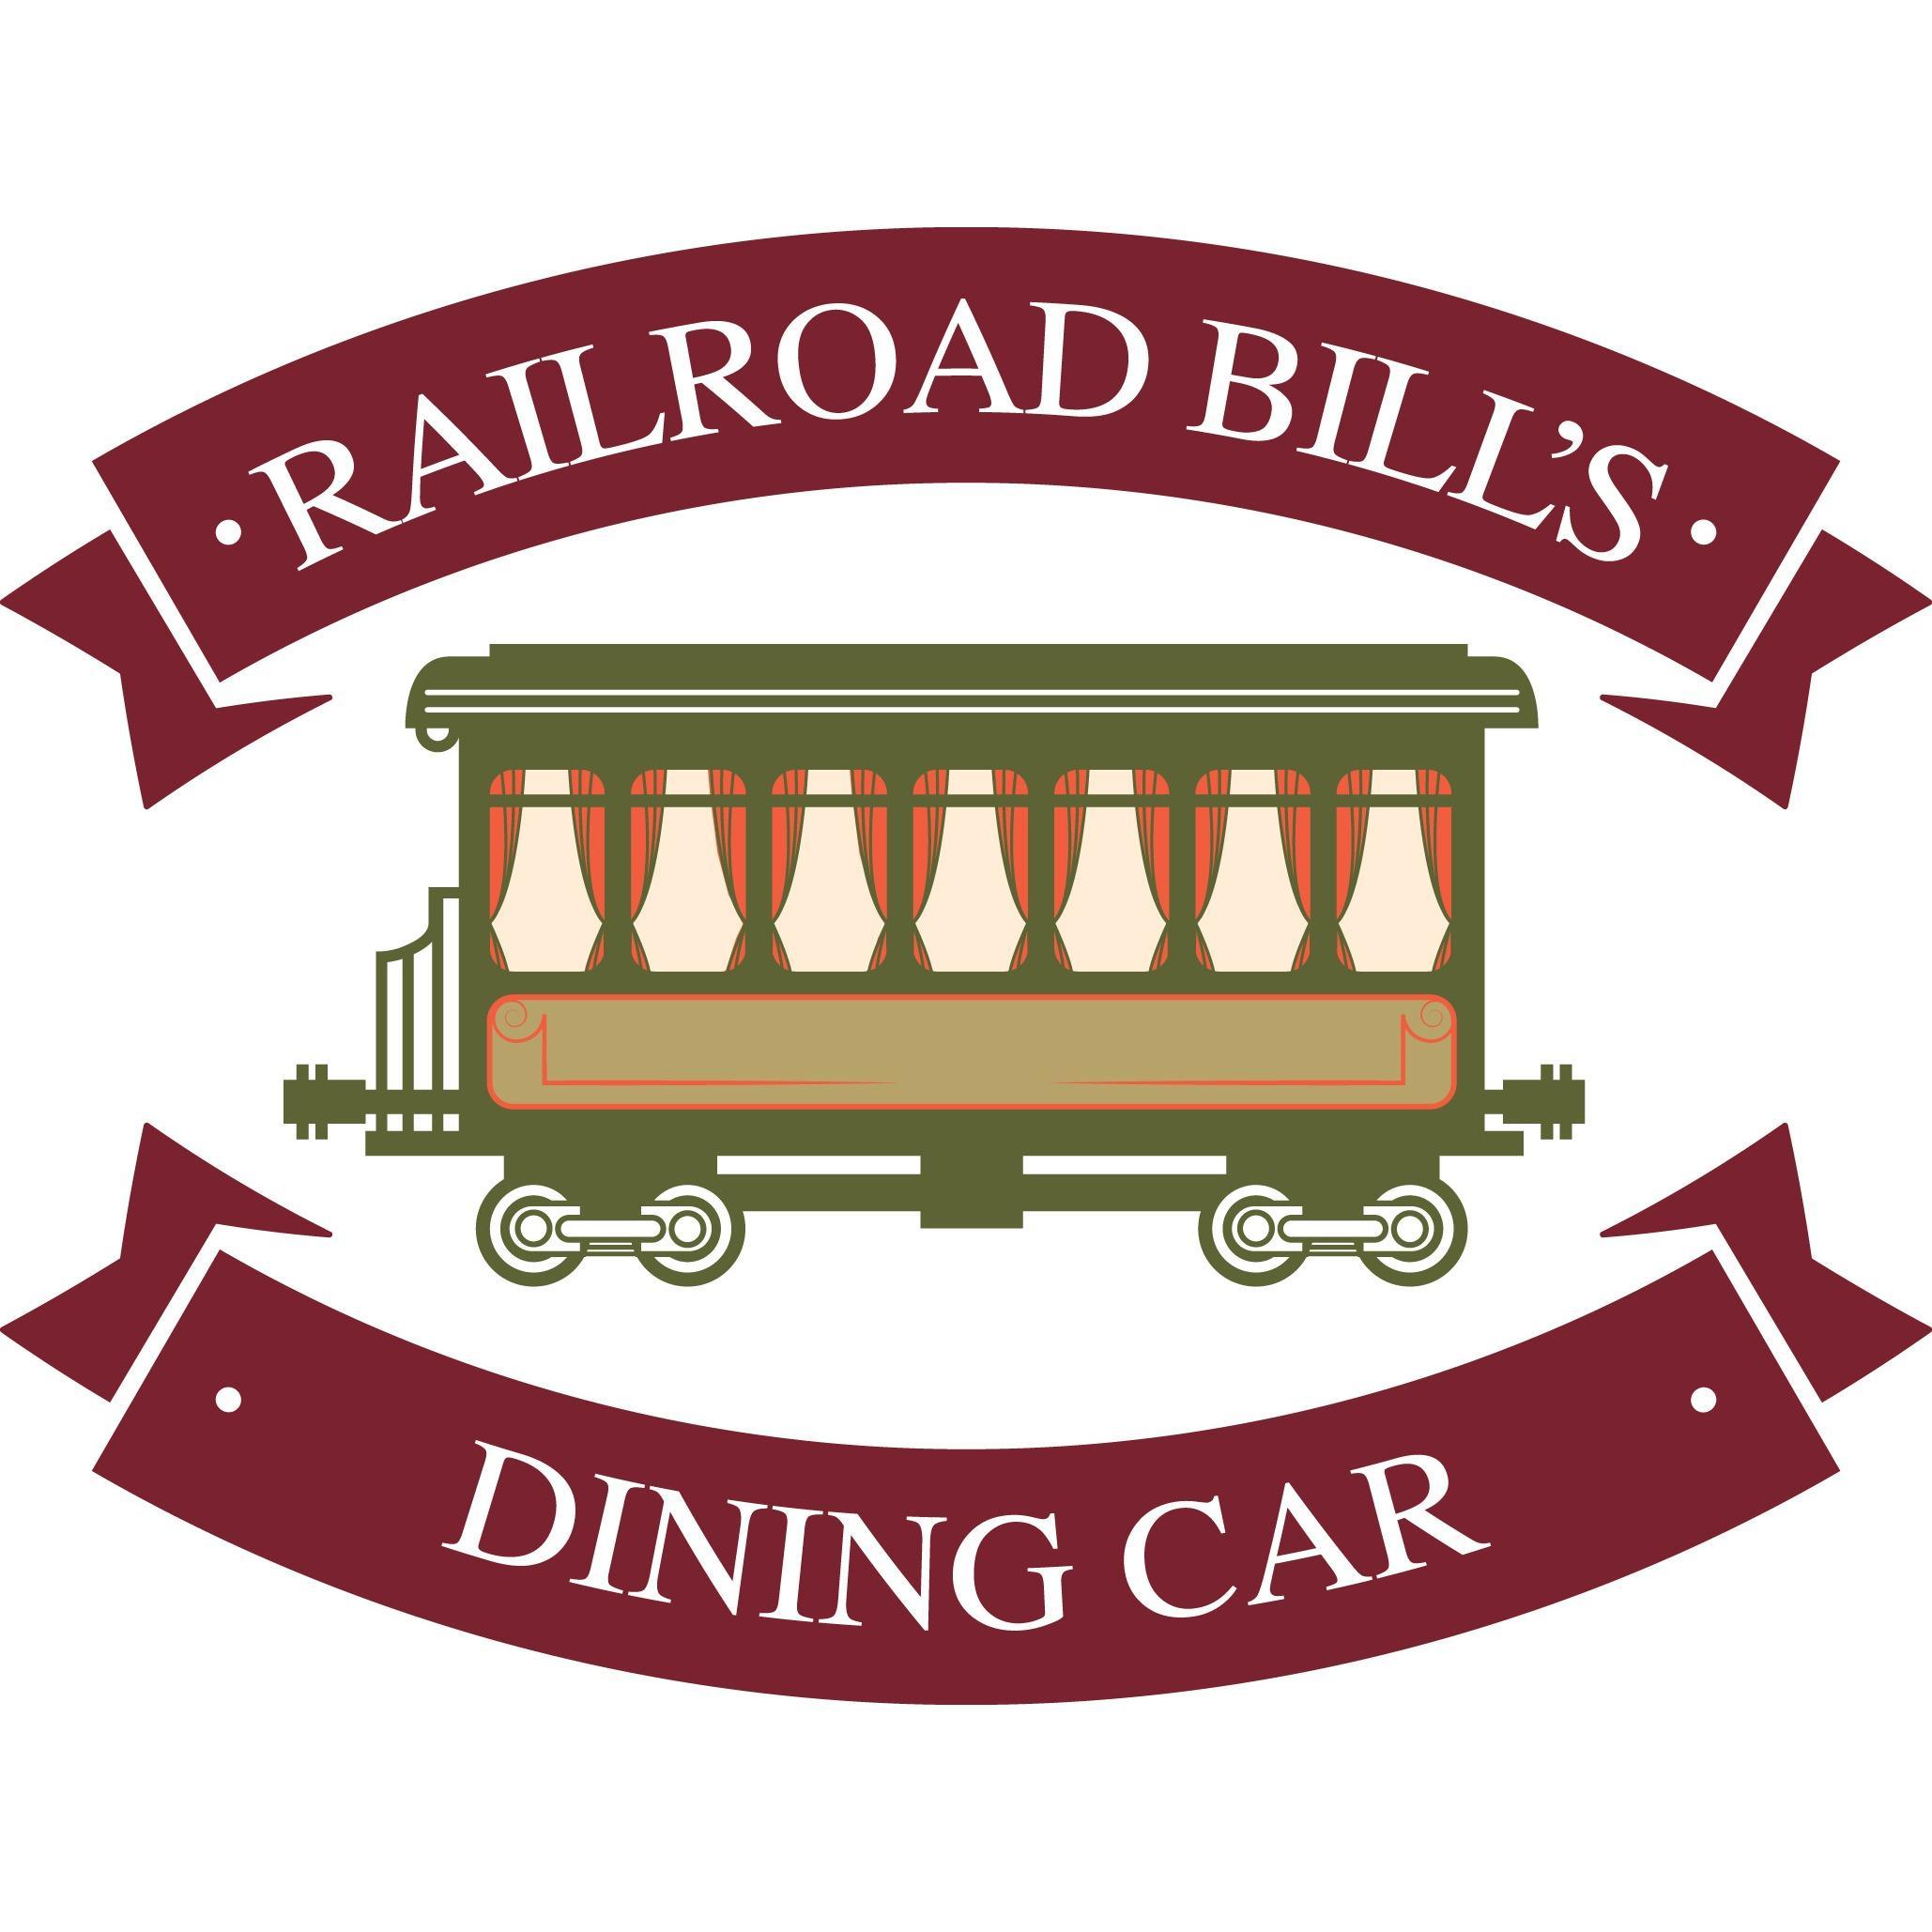 Railroad Bill's Dining Car image 0